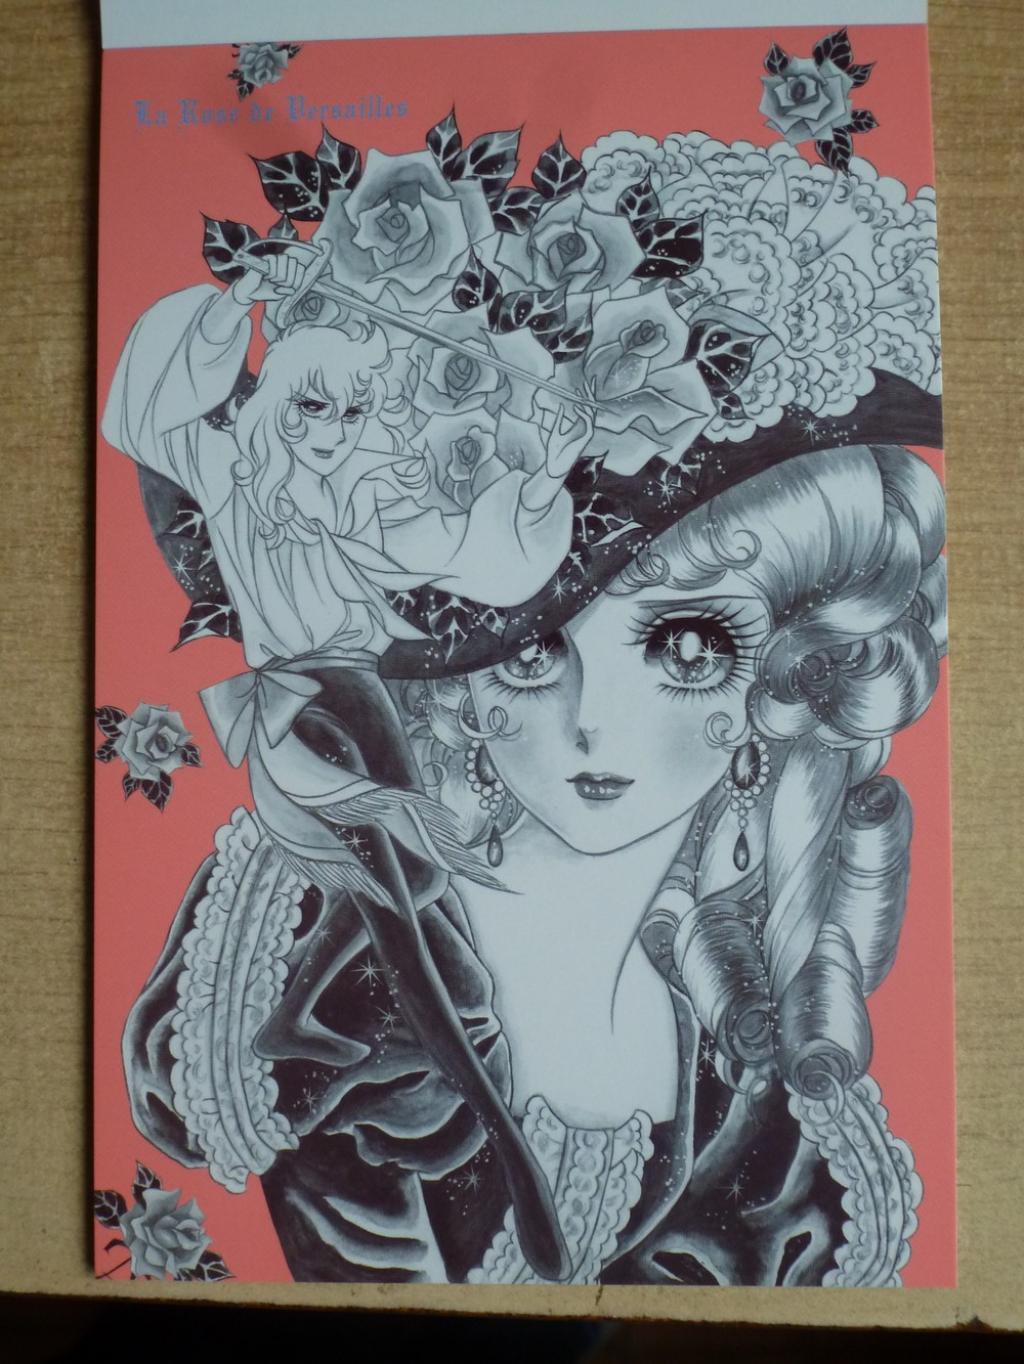 Des cartes postales La Rose de Versailles!  P1070233-56cfae5